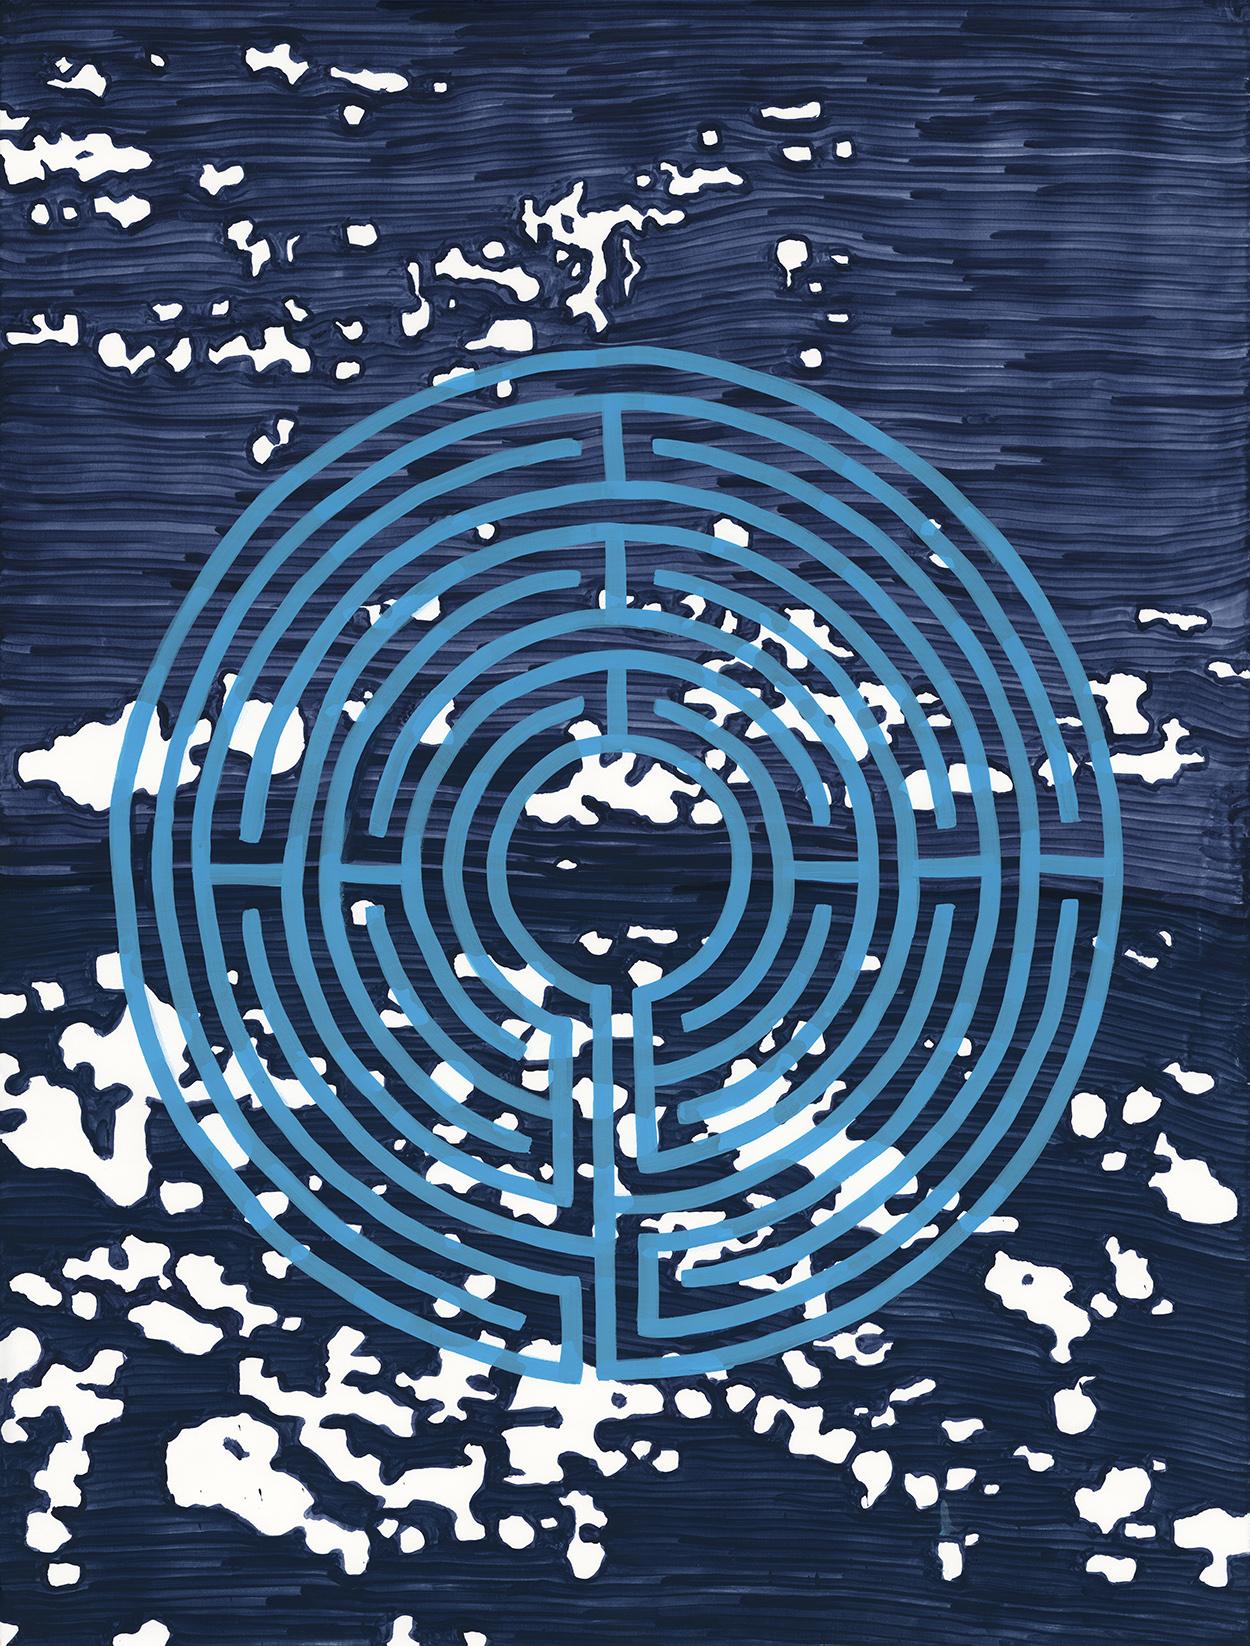 Labyrinth-Water-72dpi.jpg